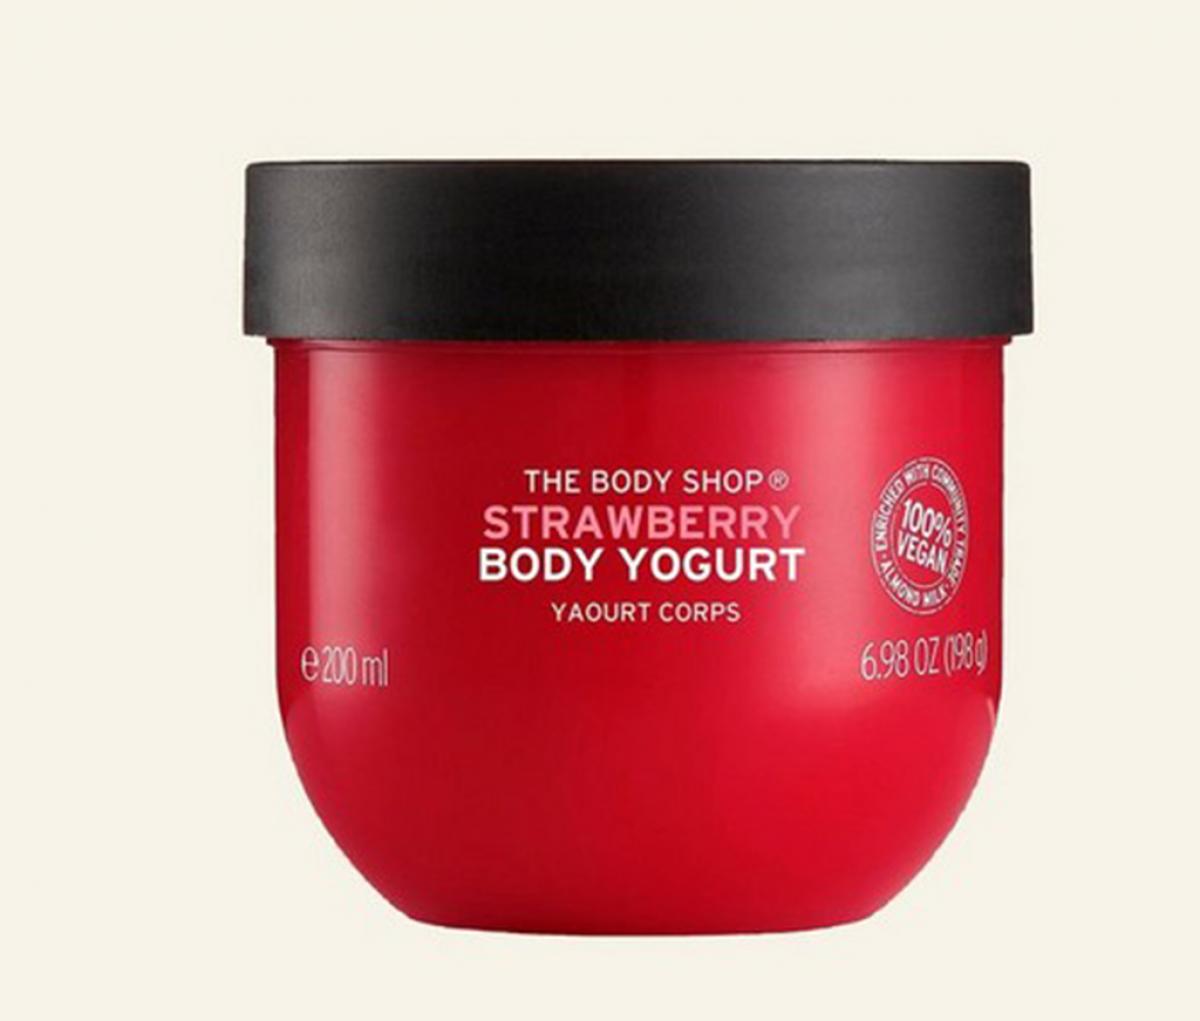 The body shop Body Yogurt Strawberry